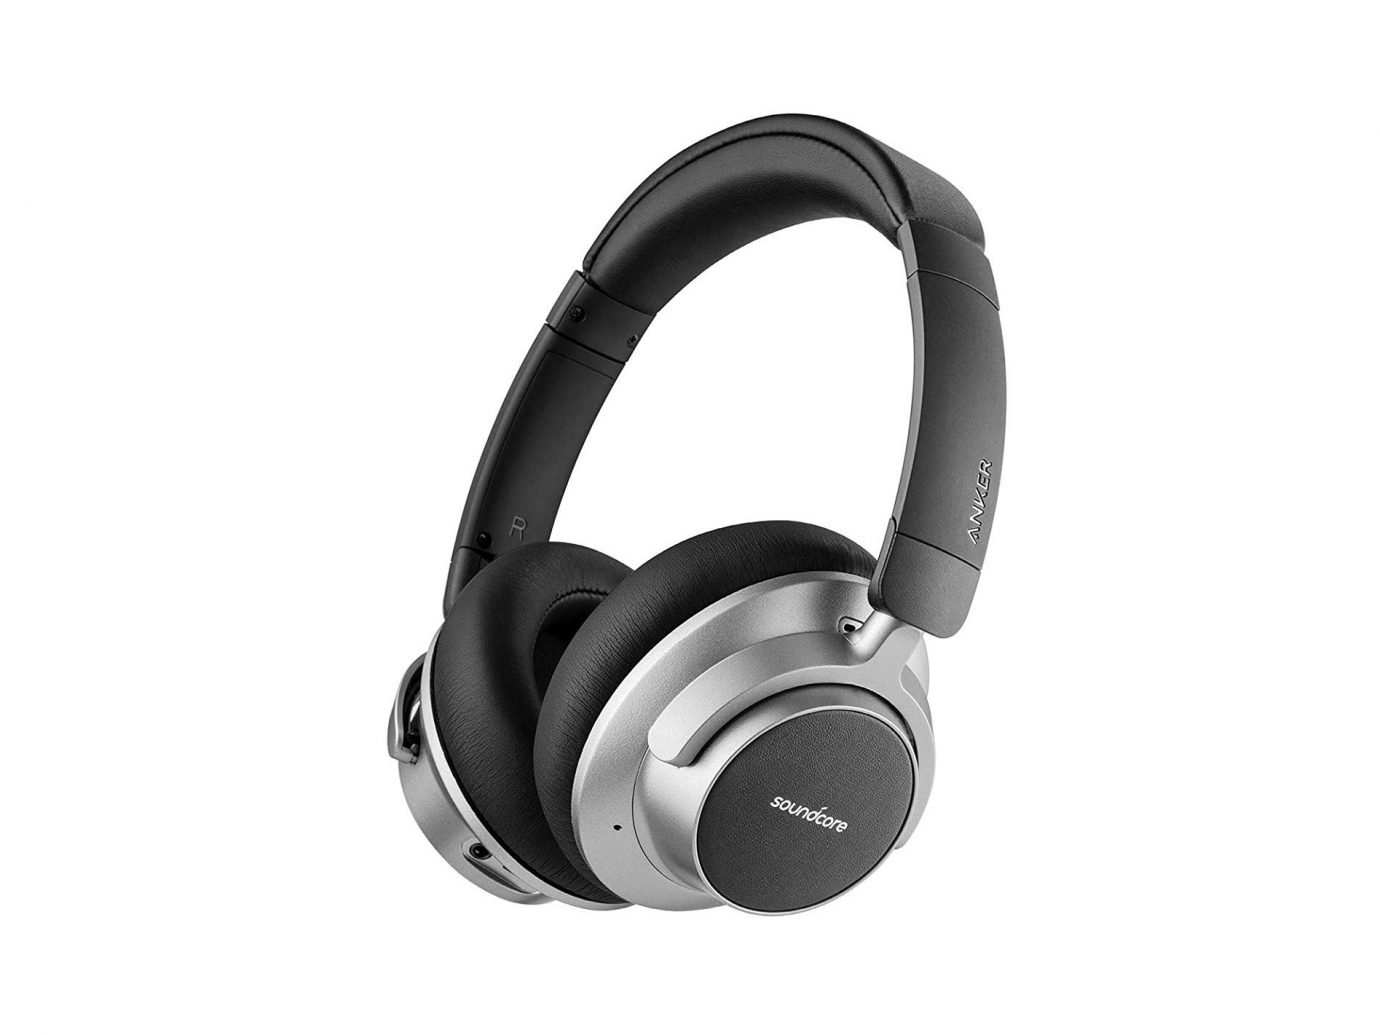 Anker Soundcore Space NC Wireless Noise Canceling Headphones